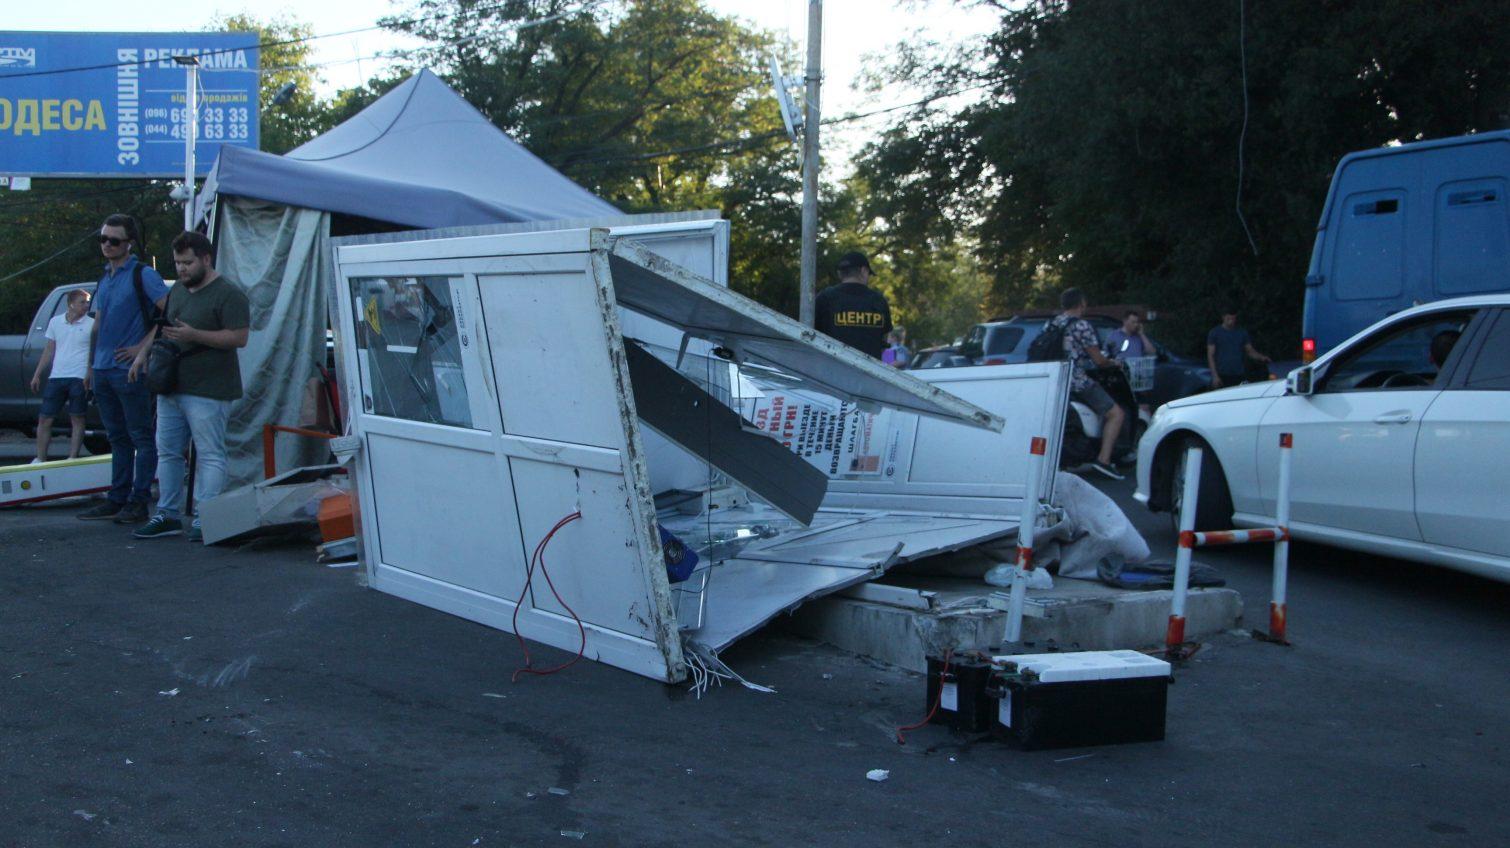 Одесситы снова снесли шлагбаум на 13-й Фонтана: на этот раз вместе с будкой (фото) «фото»